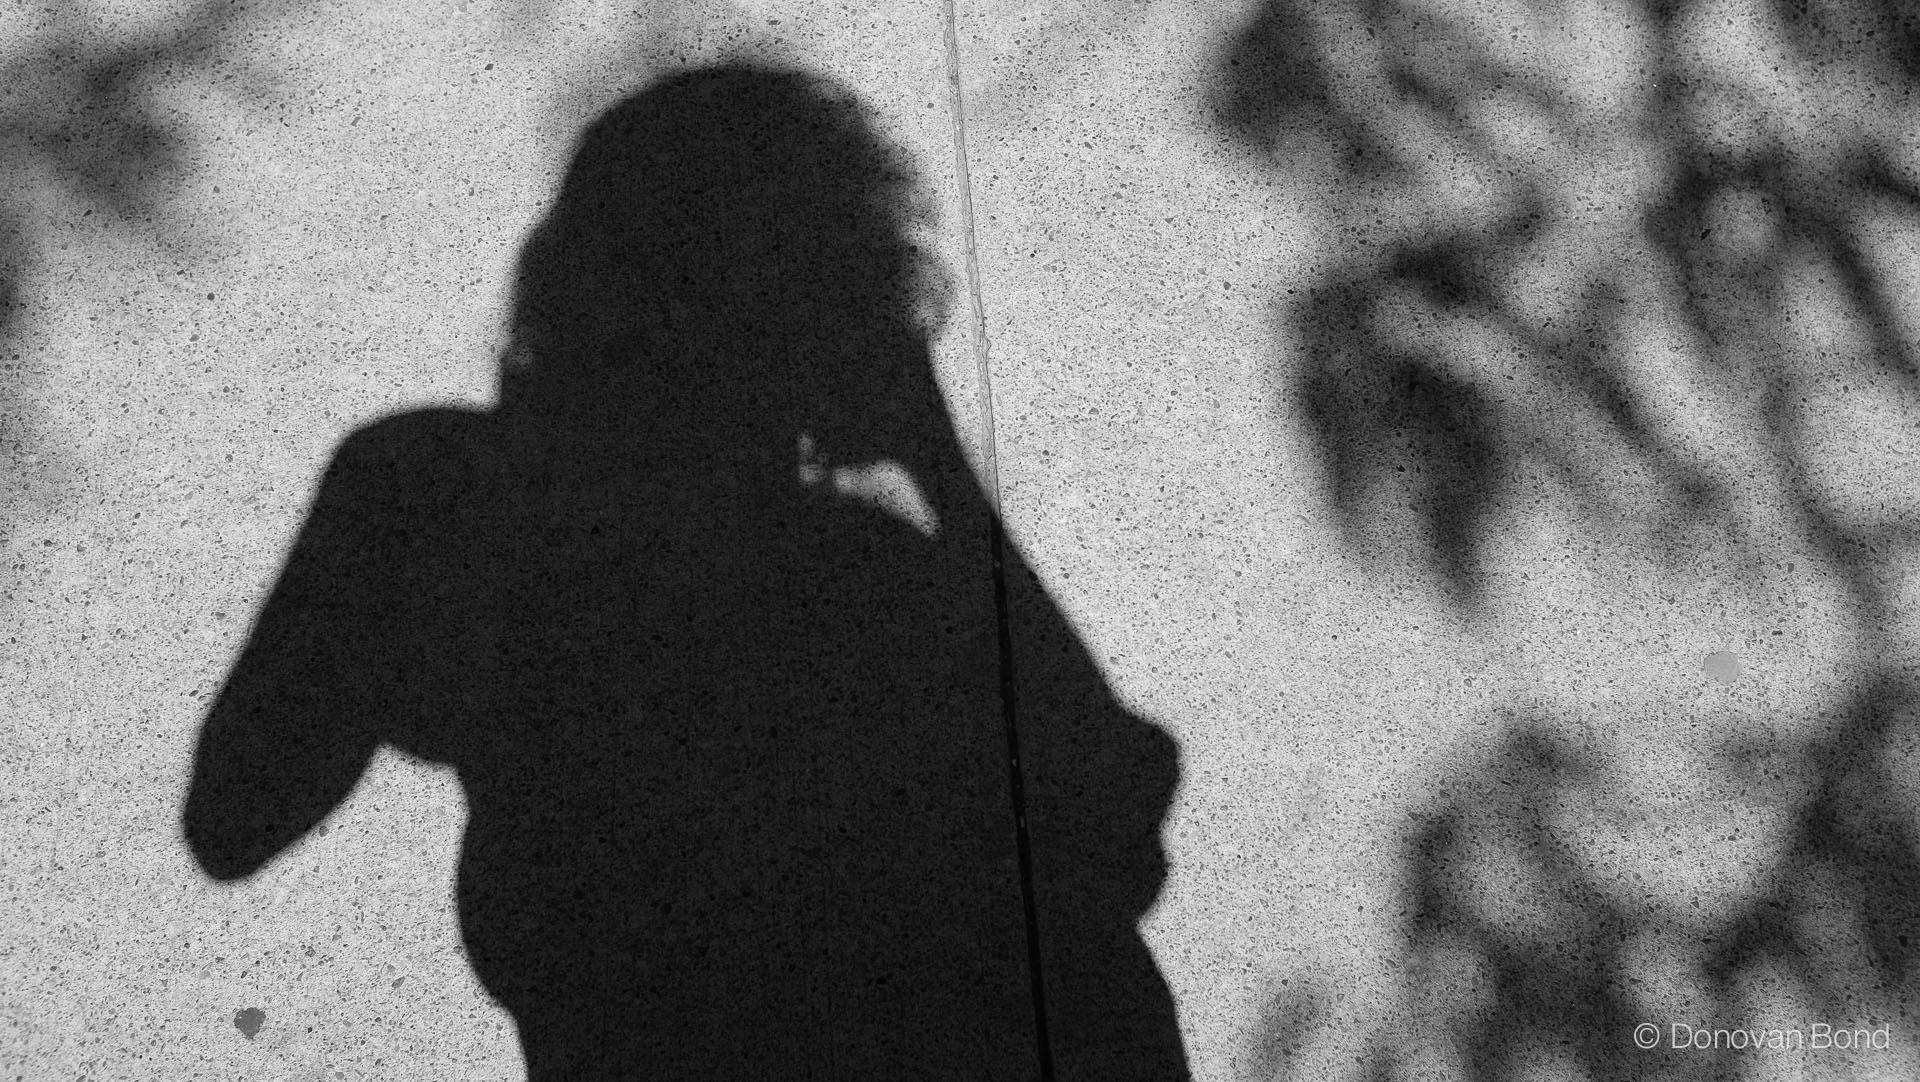 Selfie silhouette.